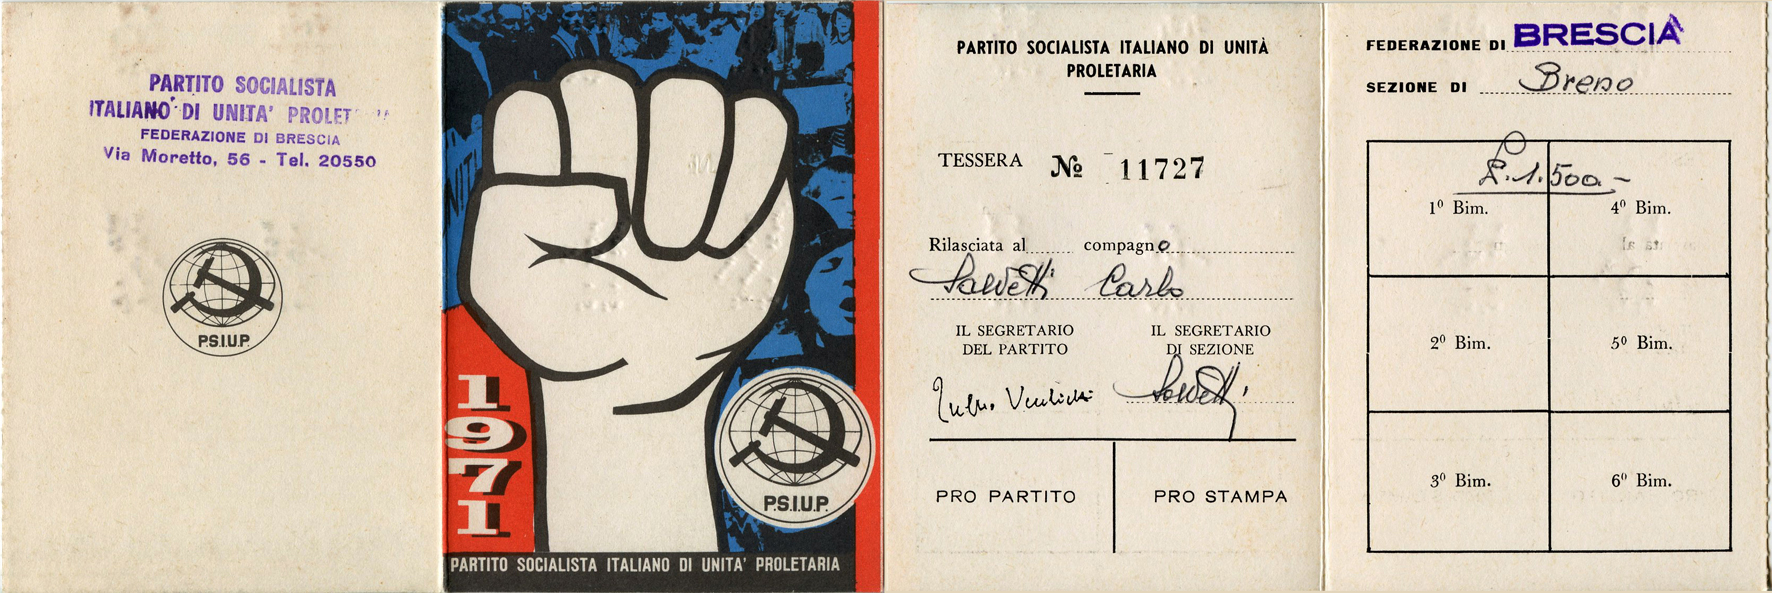 tessera 1971